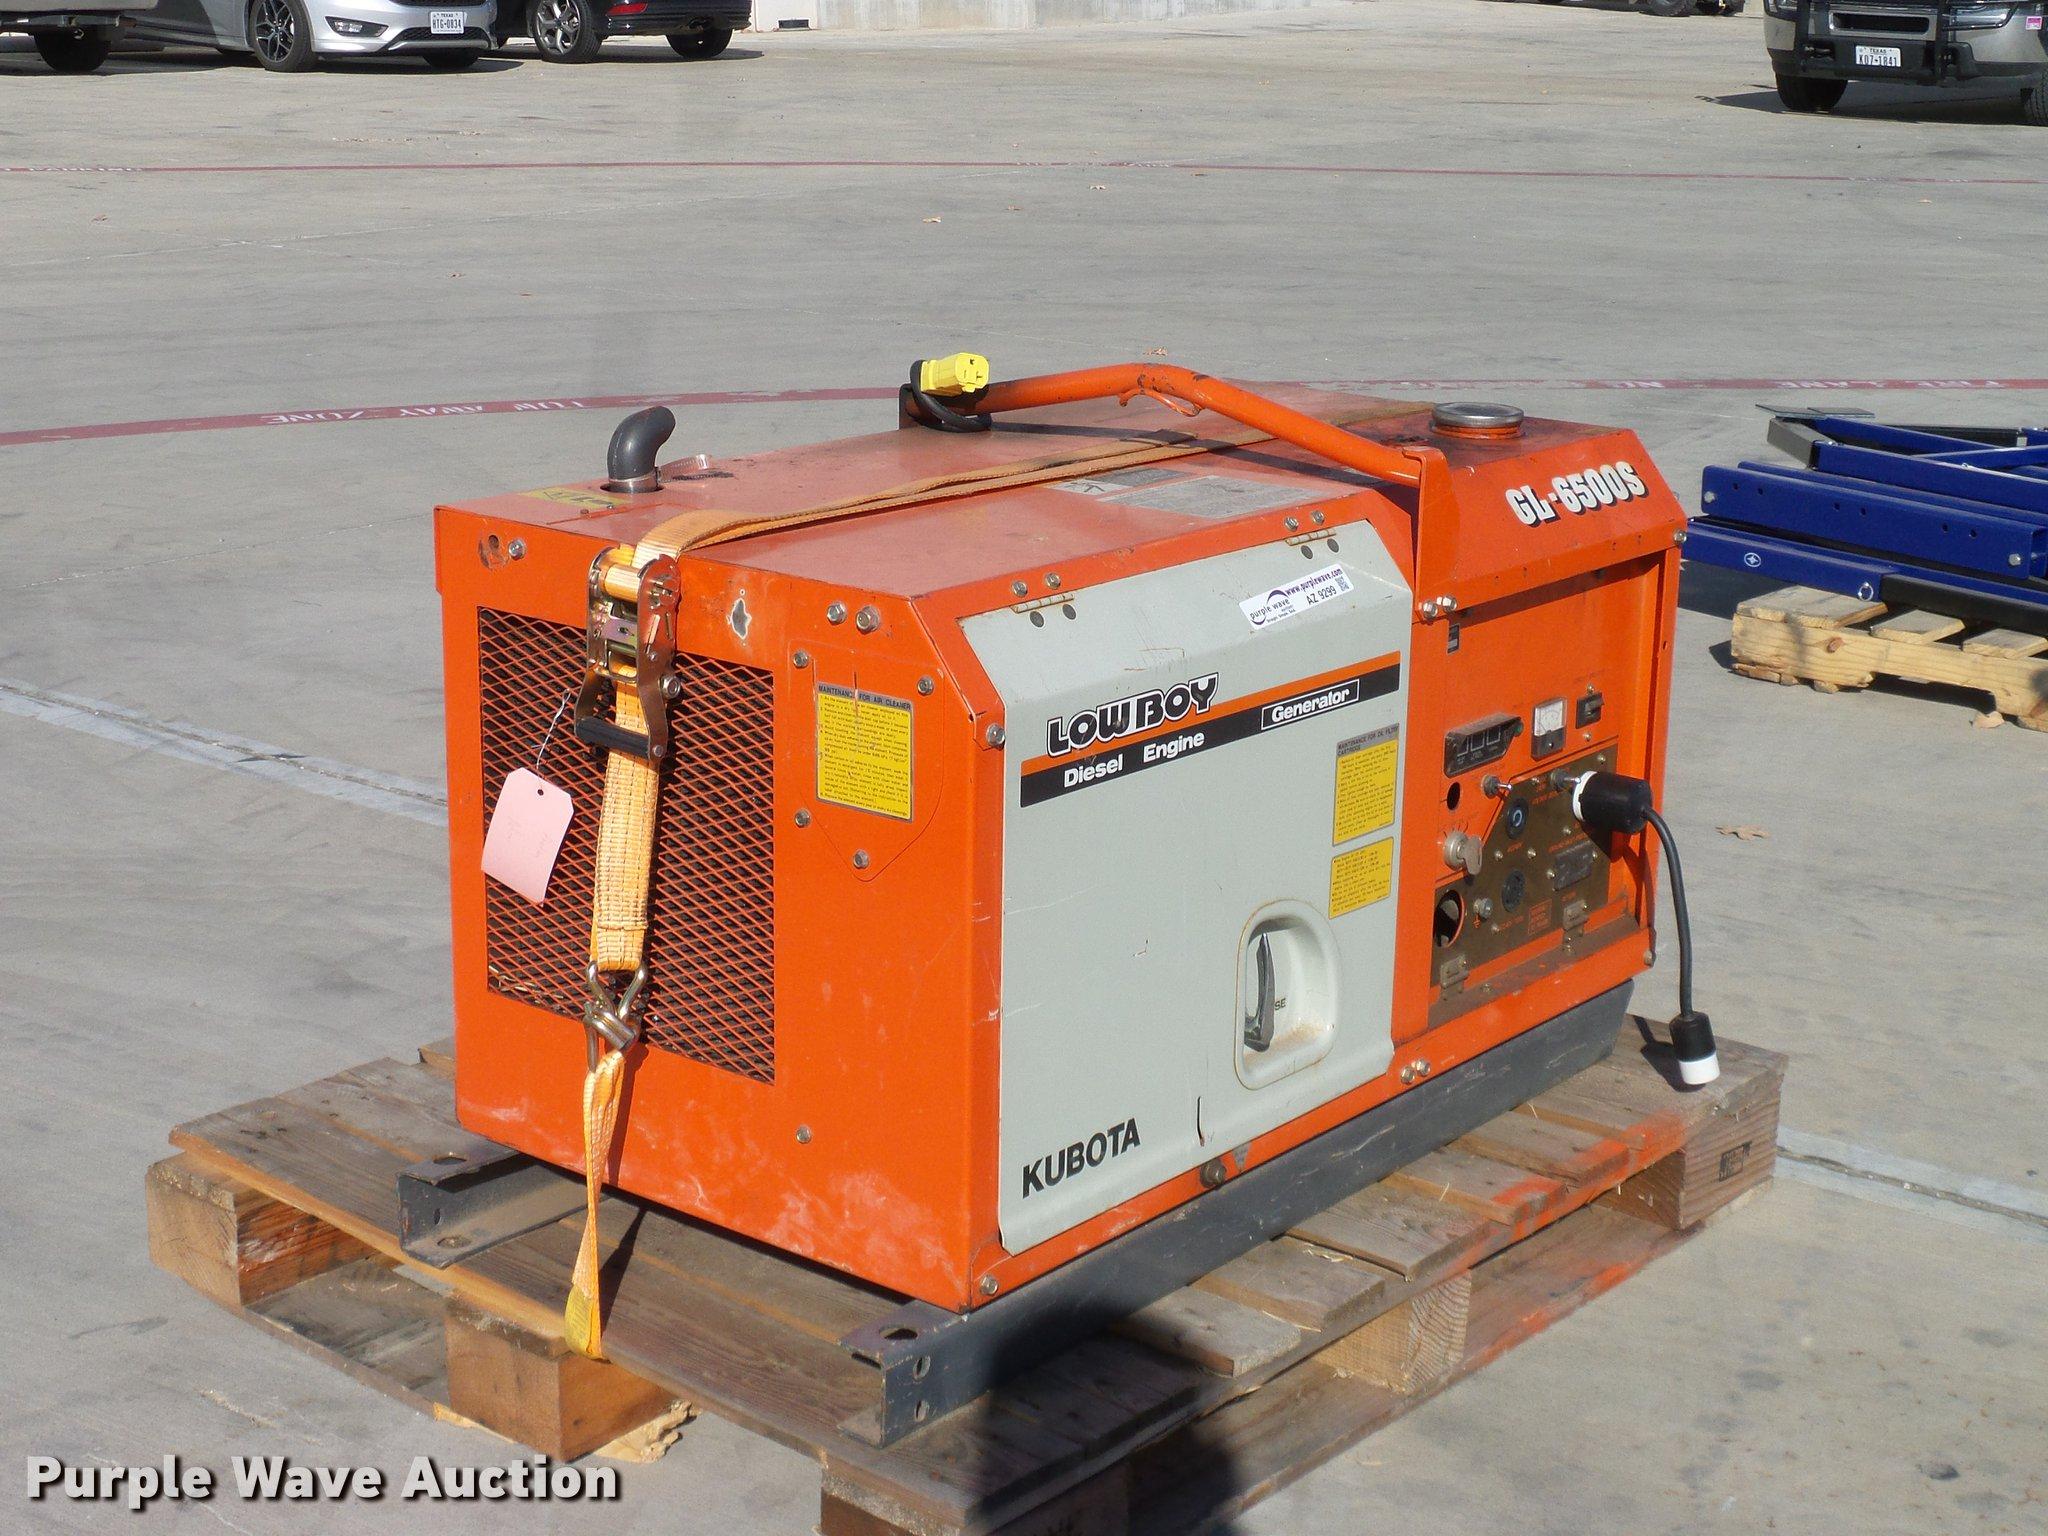 Kubota GL6500S generator Item AZ9299